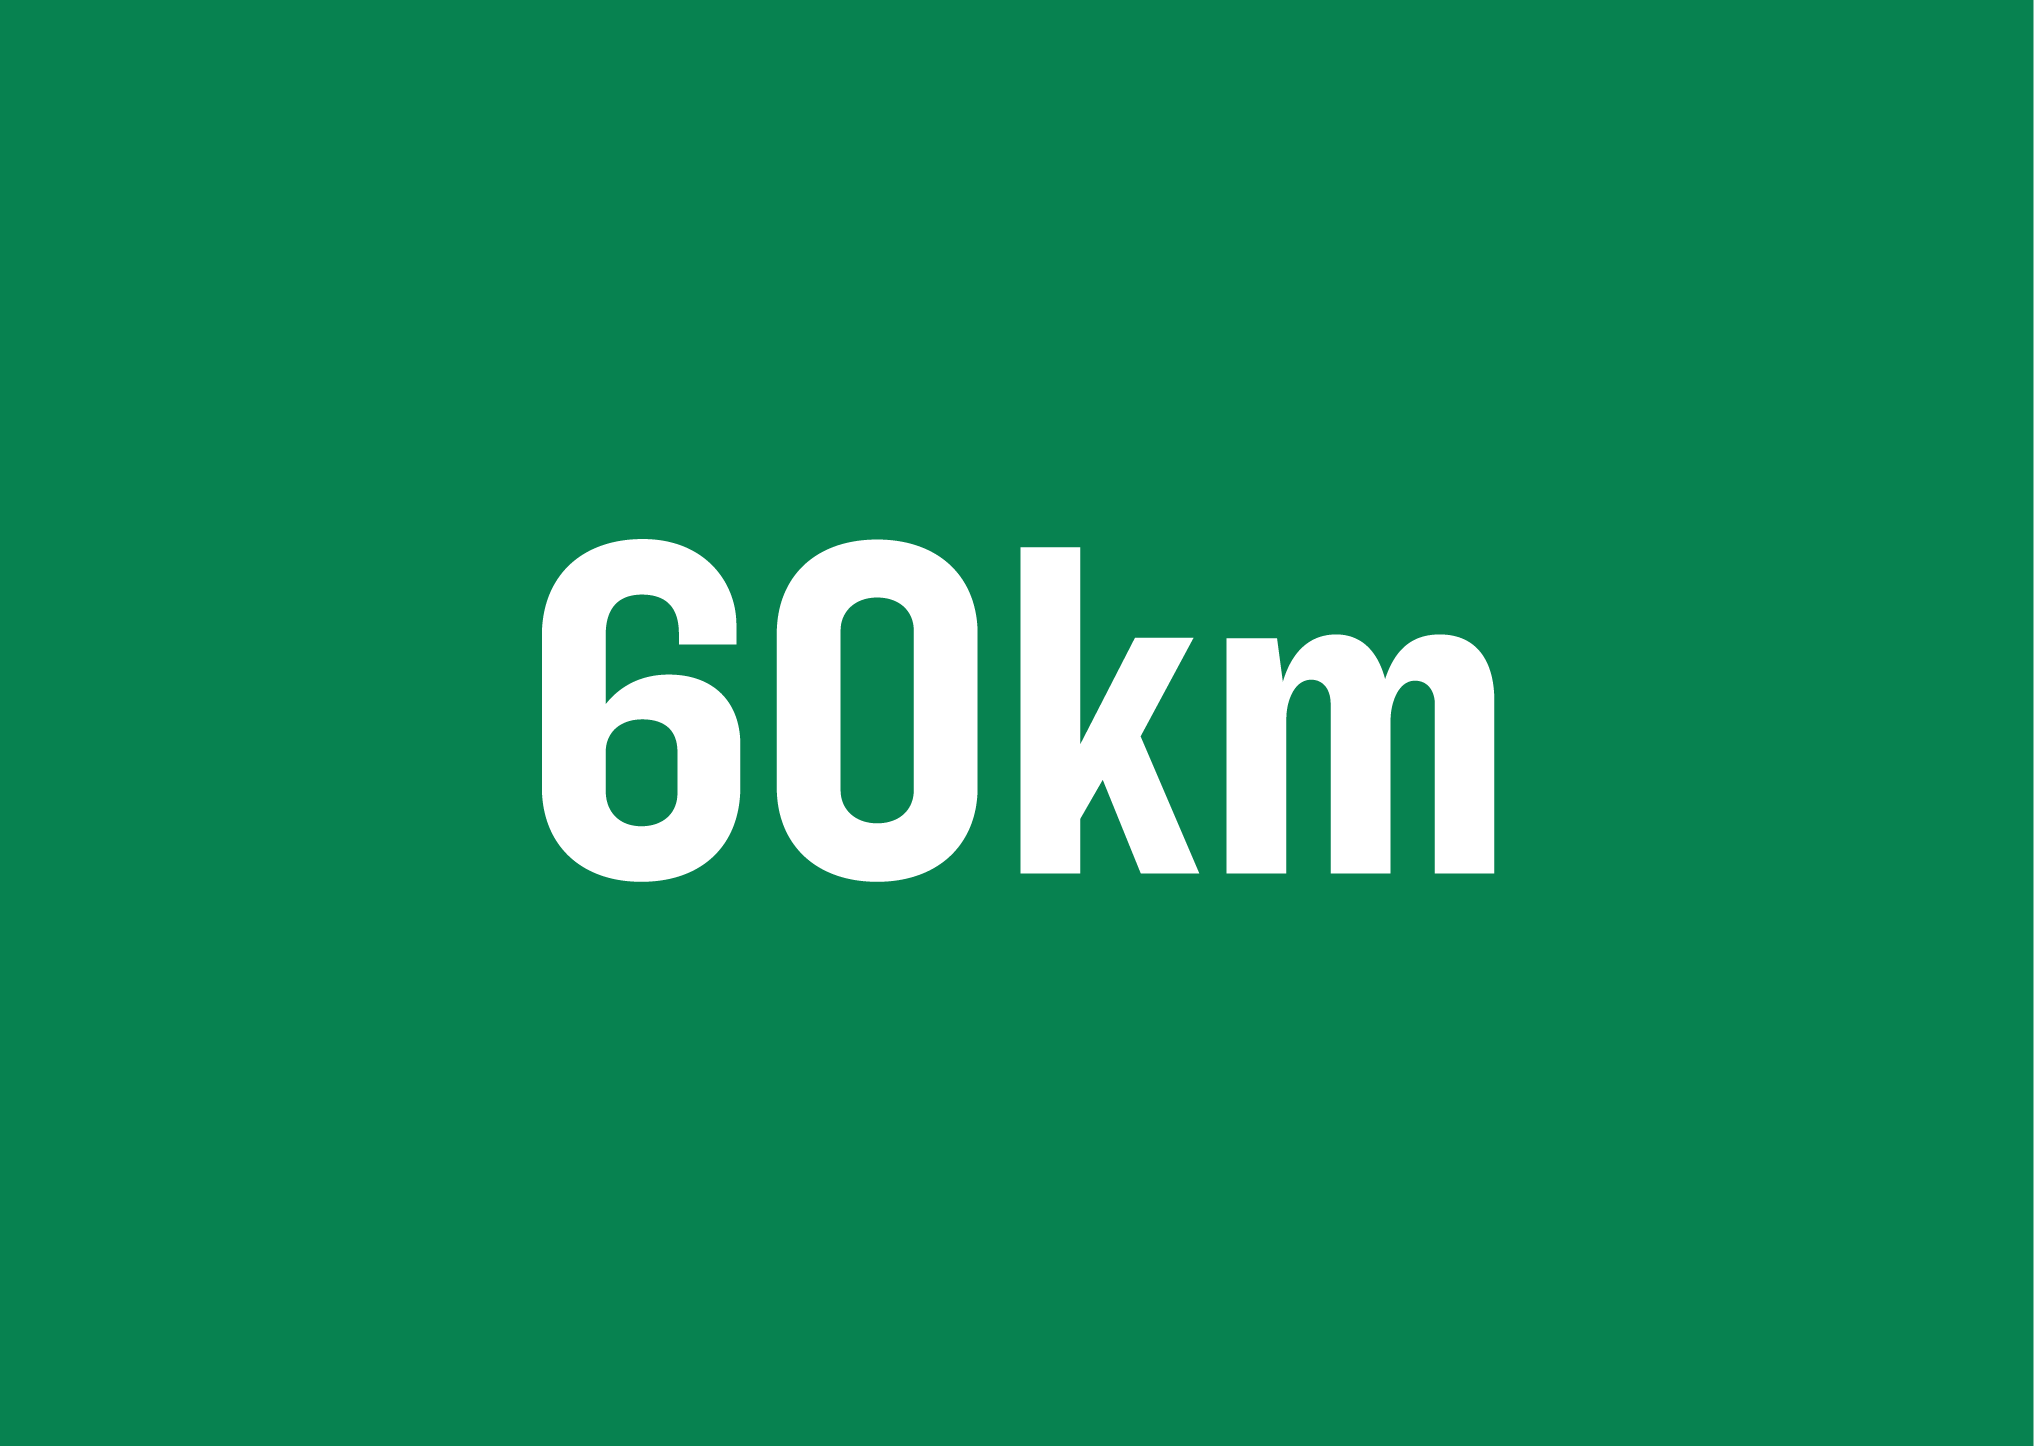 60km-01